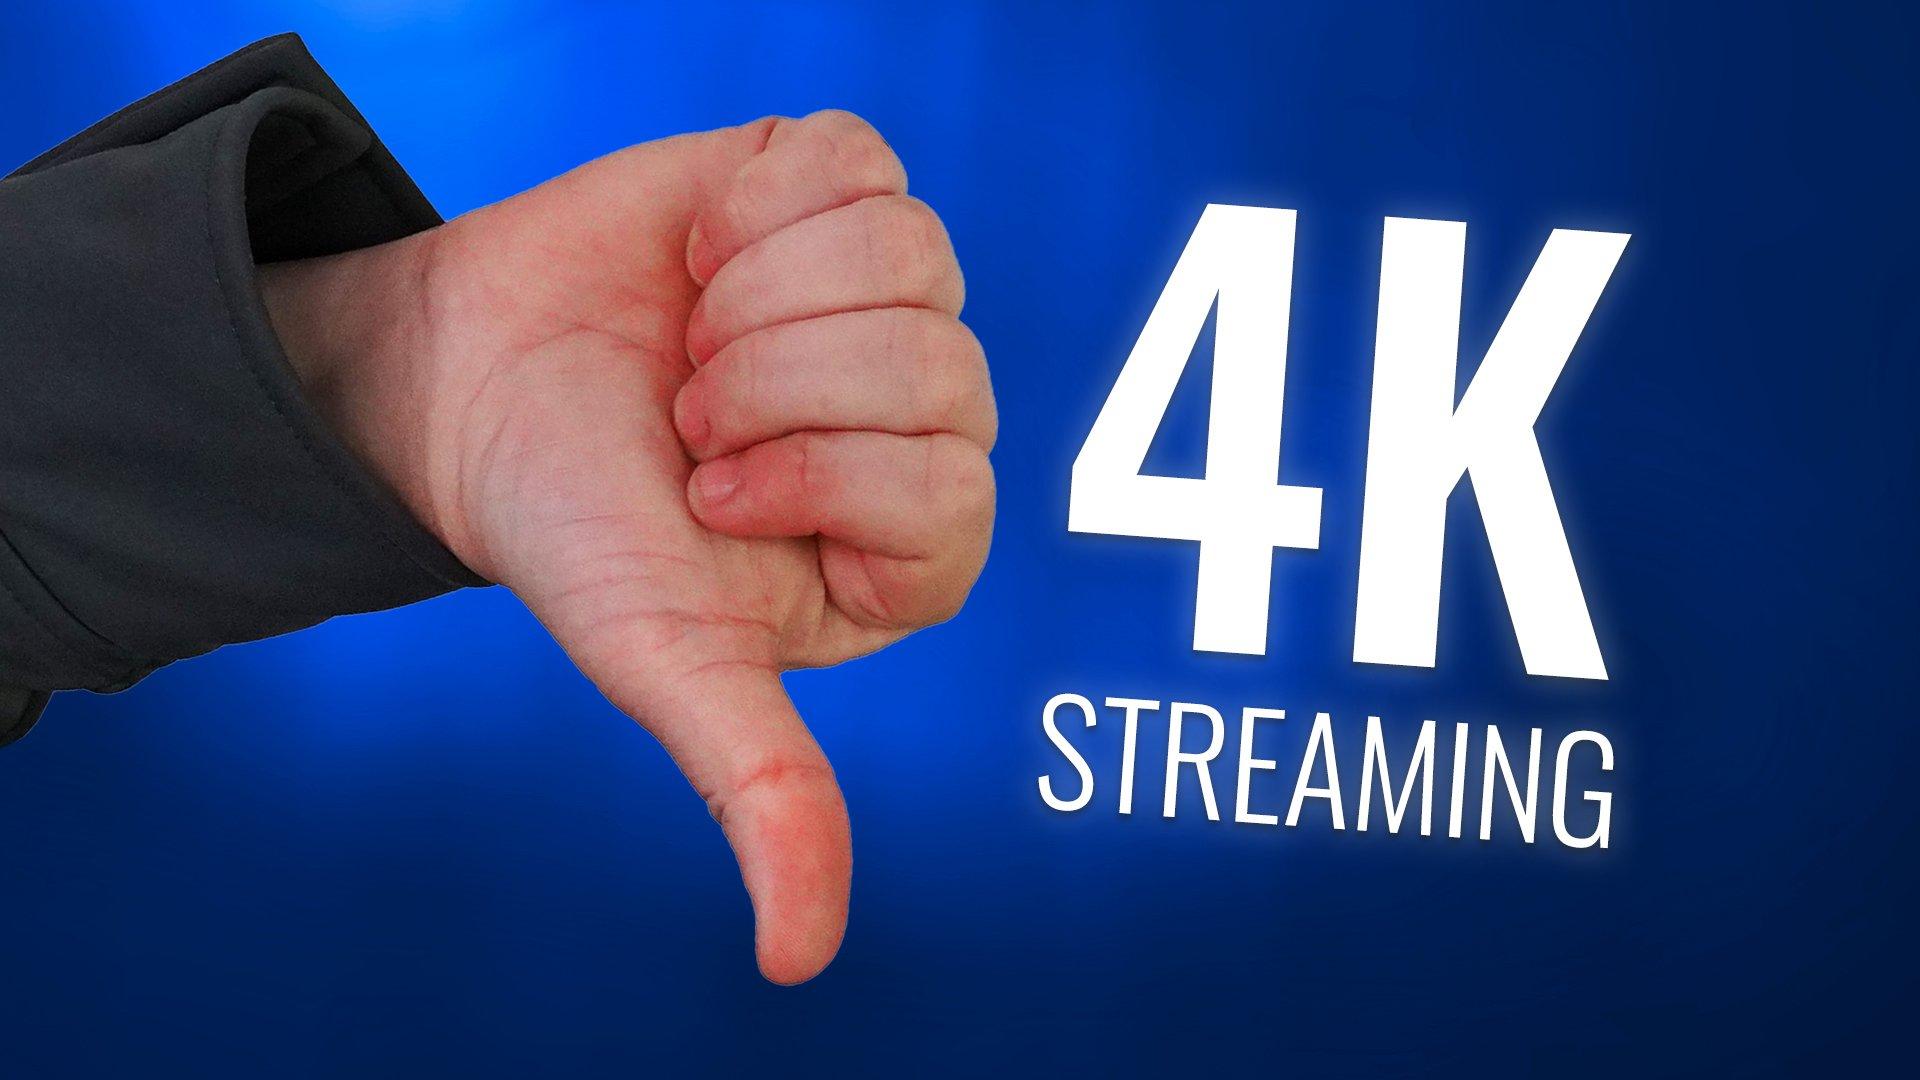 4k streaming